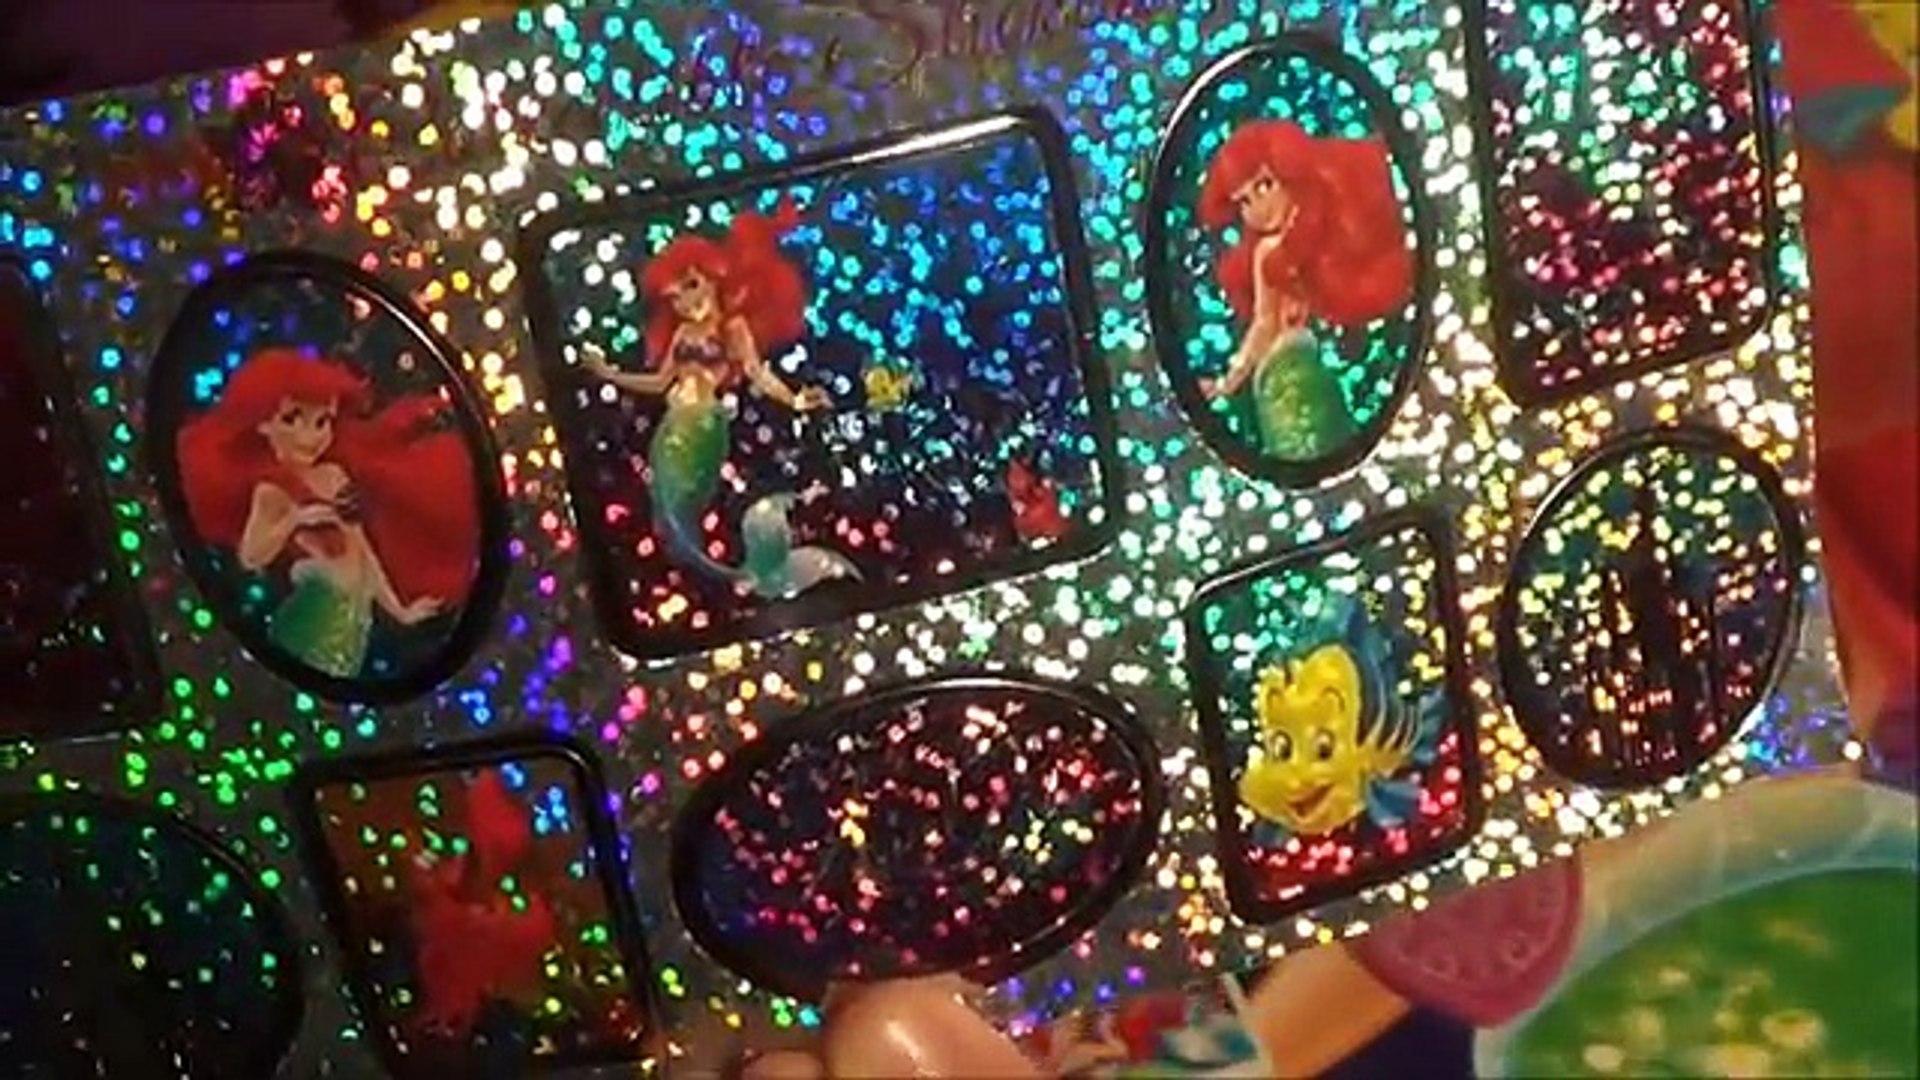 Ariel jugar Martes submarino Castillo doh | castillo ariel doh | b2cutecupcakes